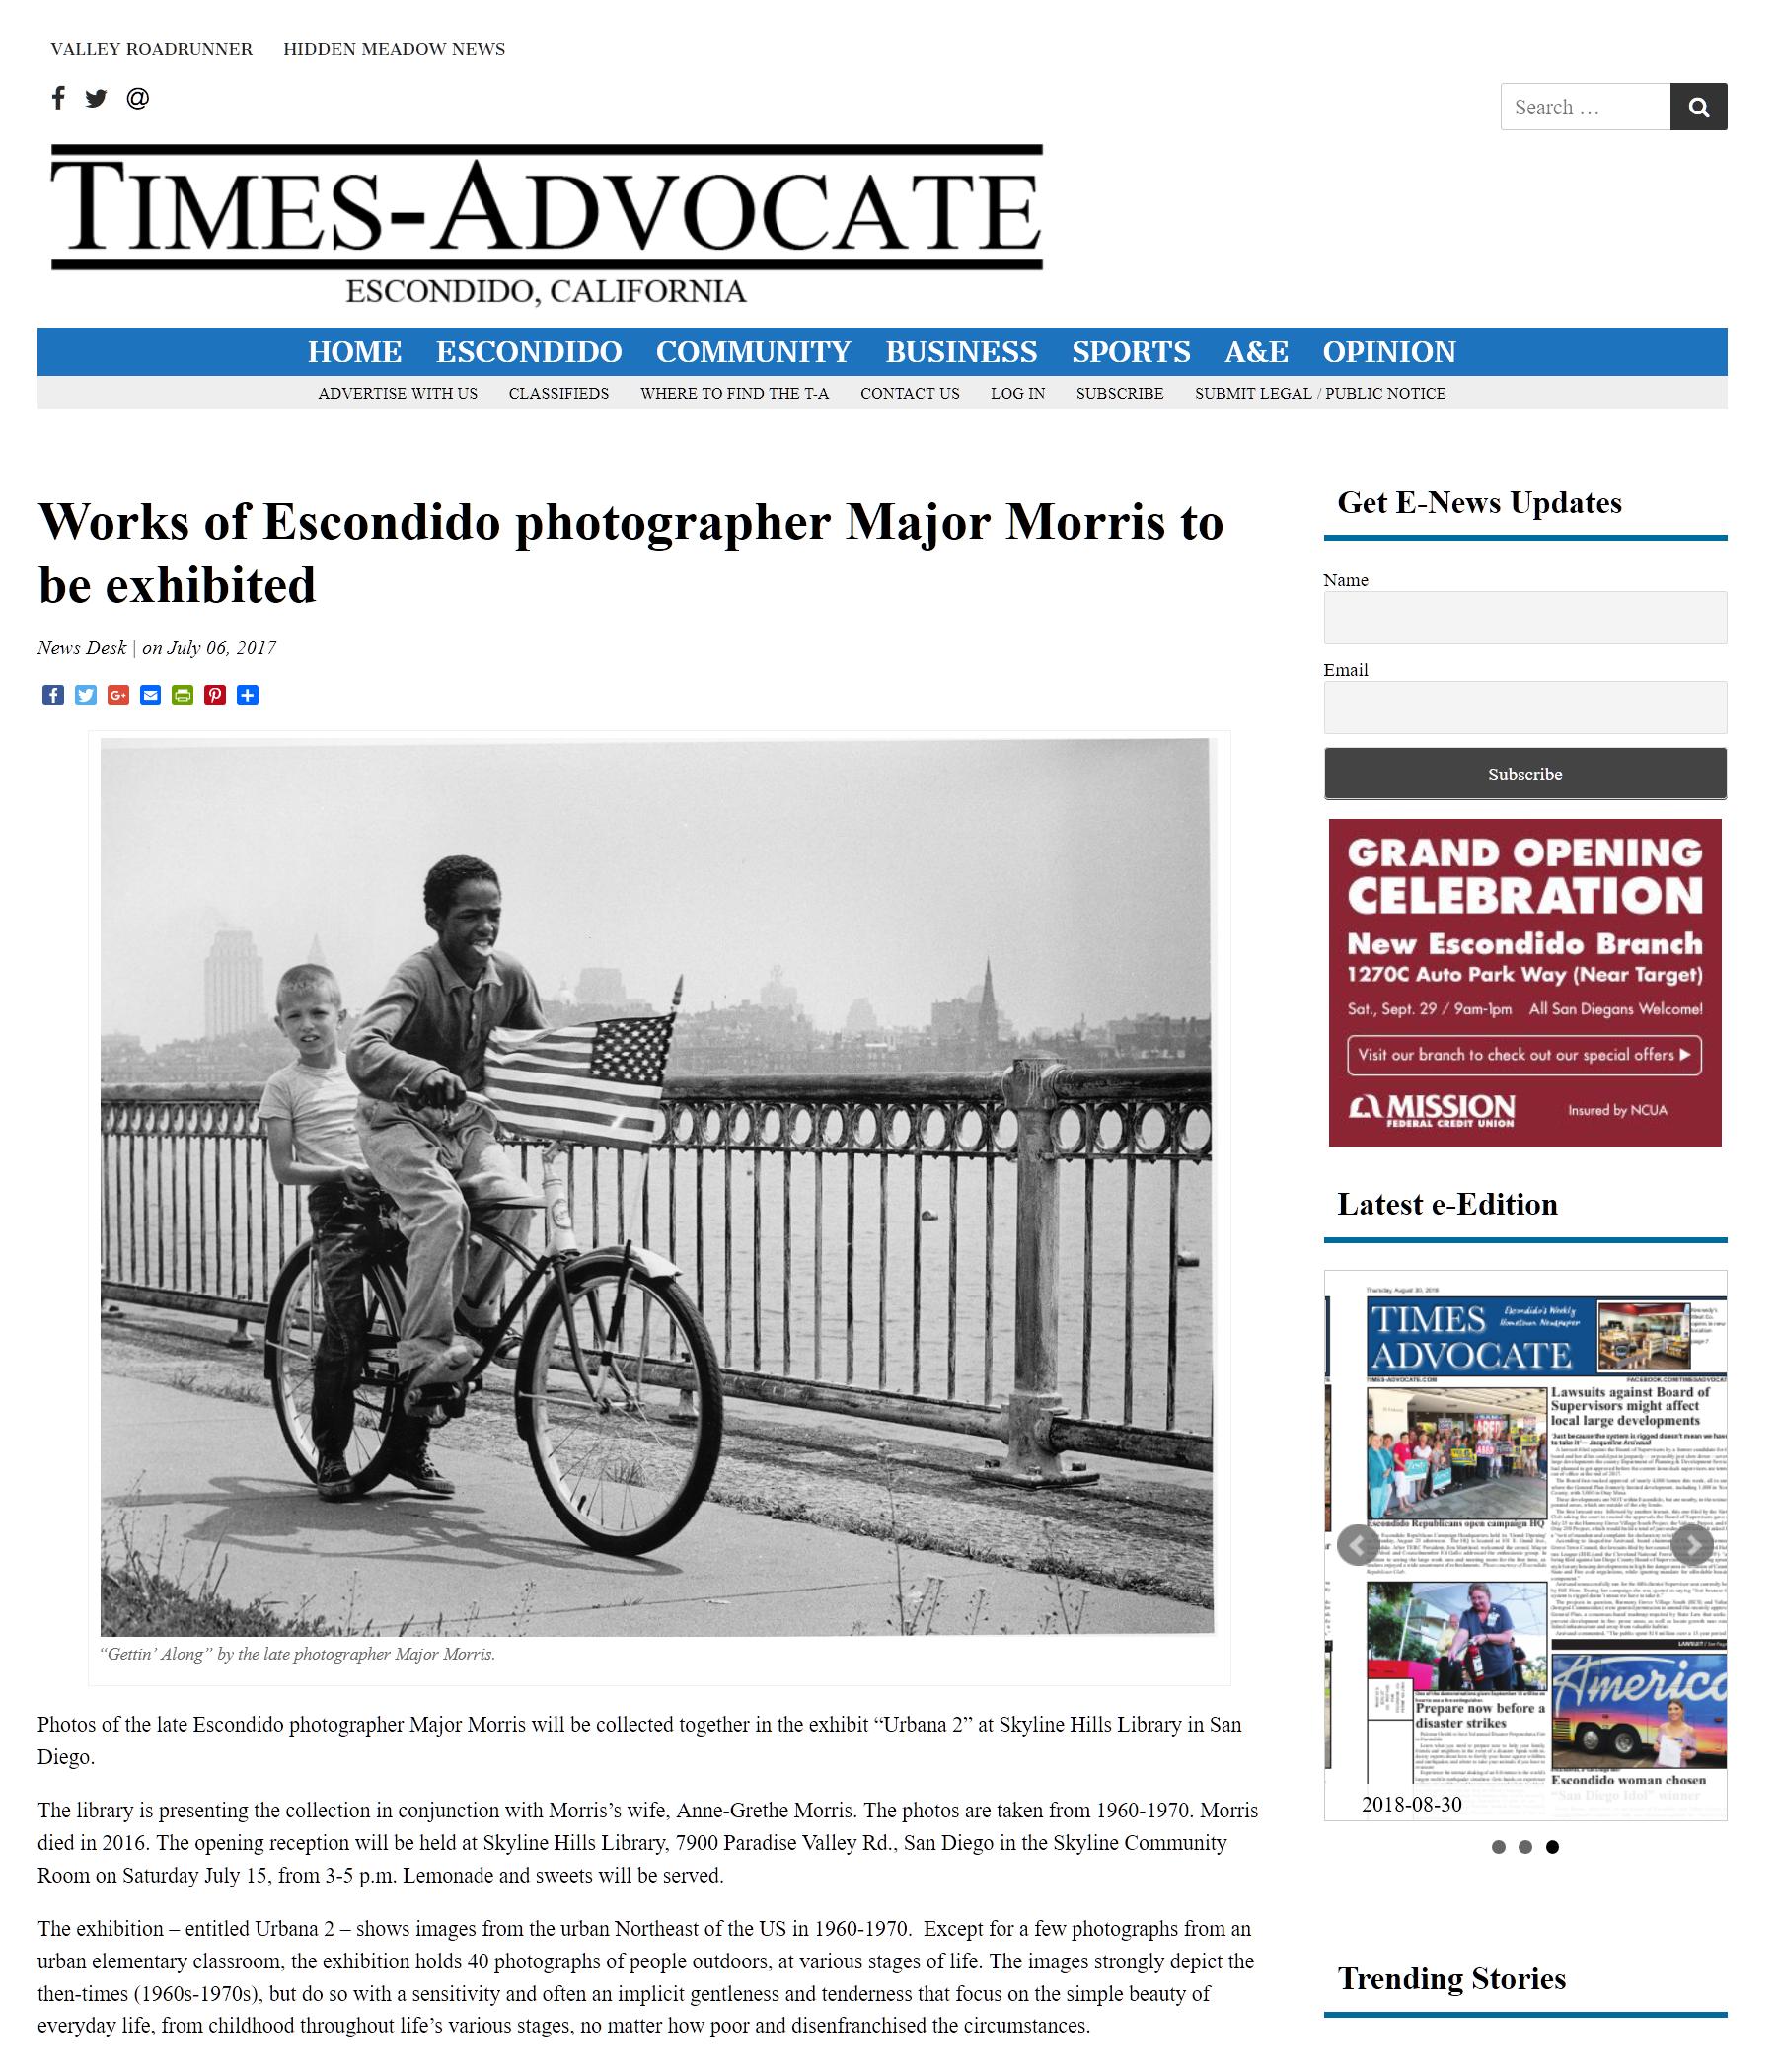 Screenshot_2018-09-19 Works of Escondido photographer Major Morris to be exhibited Escondido Times-Advocate.png